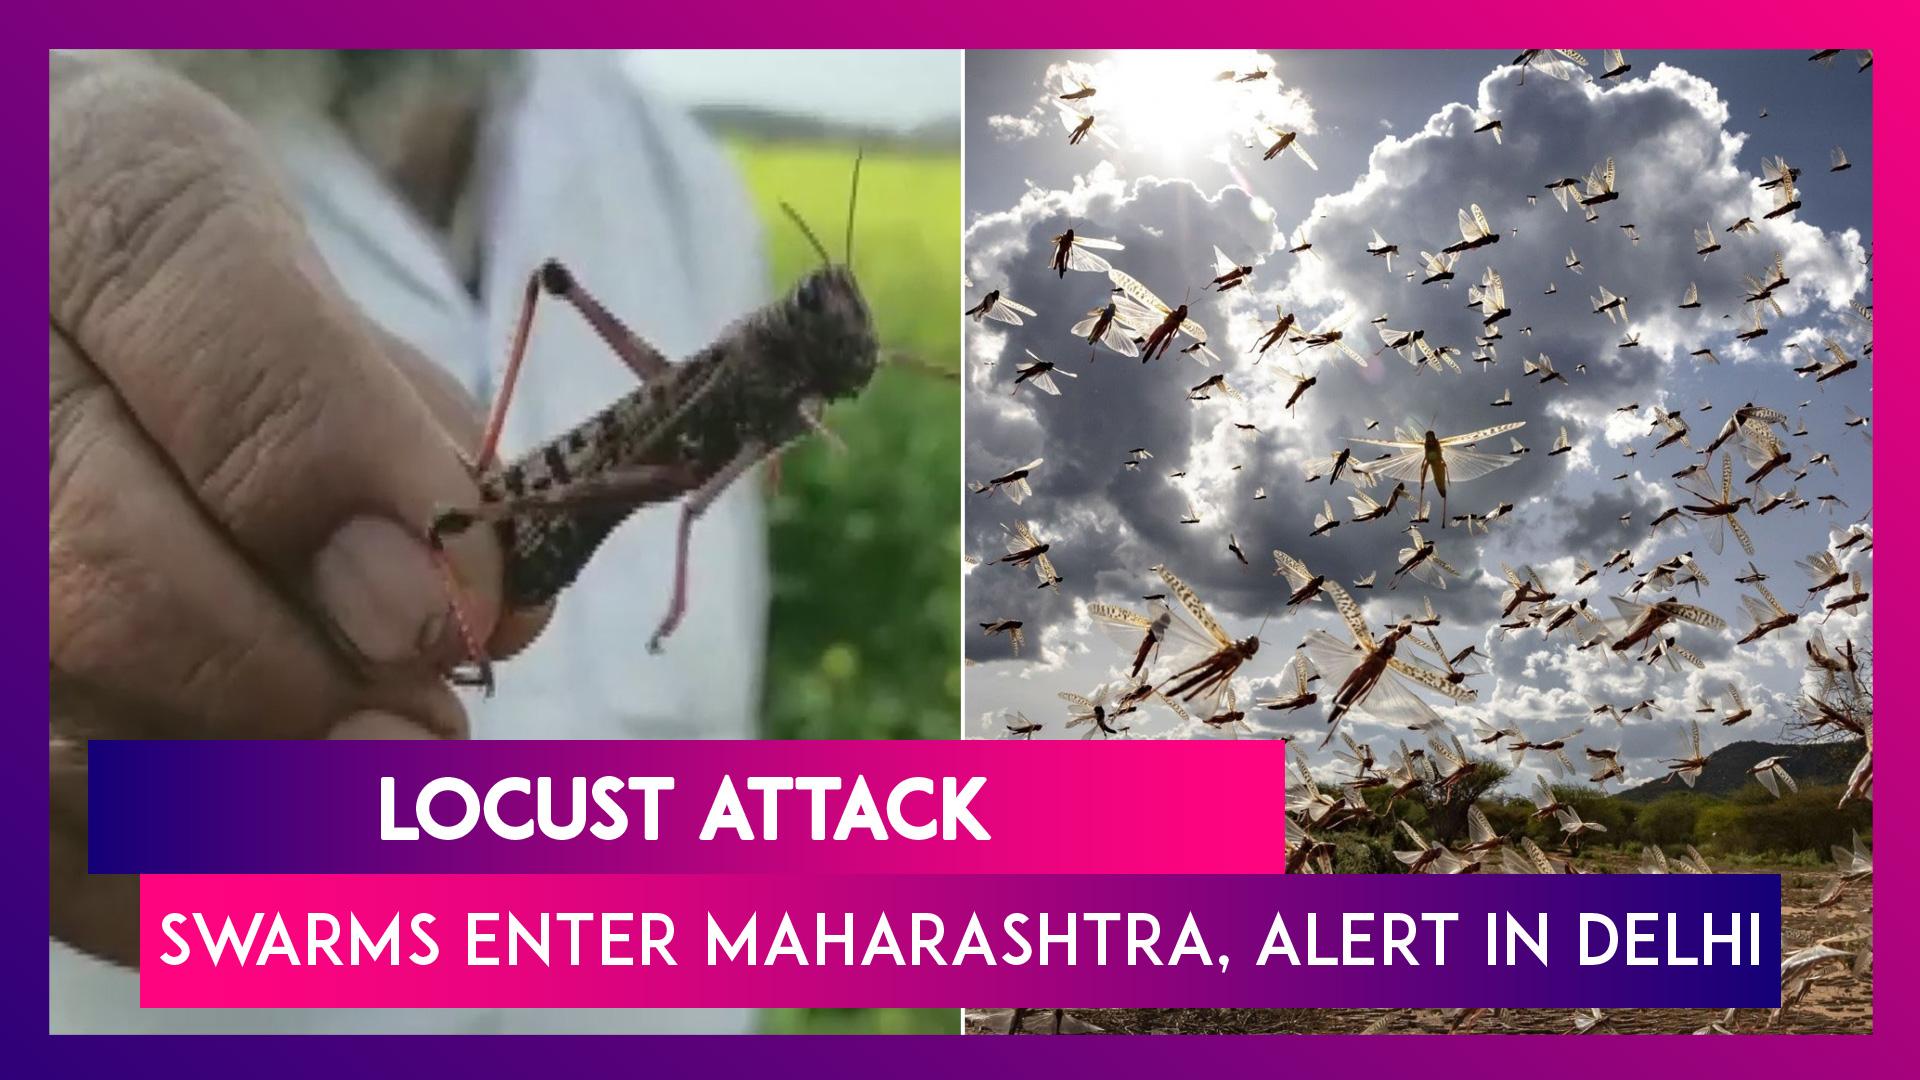 Locust Swarms Enter Maharashtra, Delhi On Alert While UP Govt Deals With Tiddi Dal Attack In Jhansi